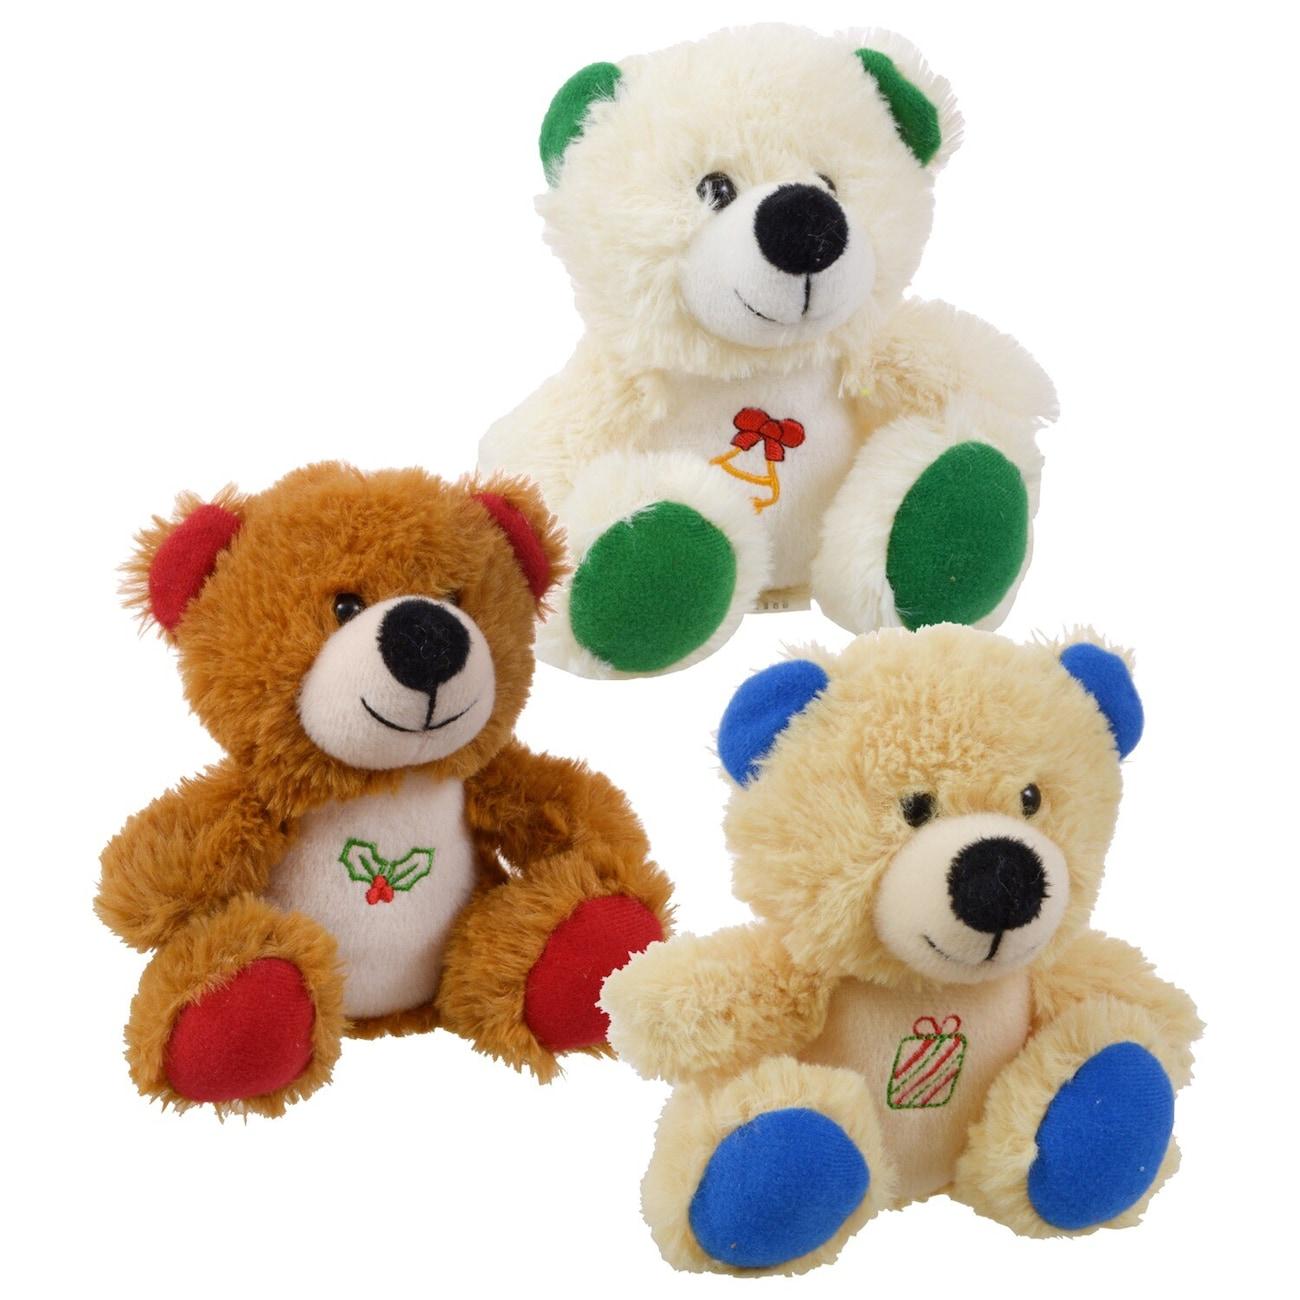 christmas house plush sitting holiday bears 6 in - Christmas Plush Toys